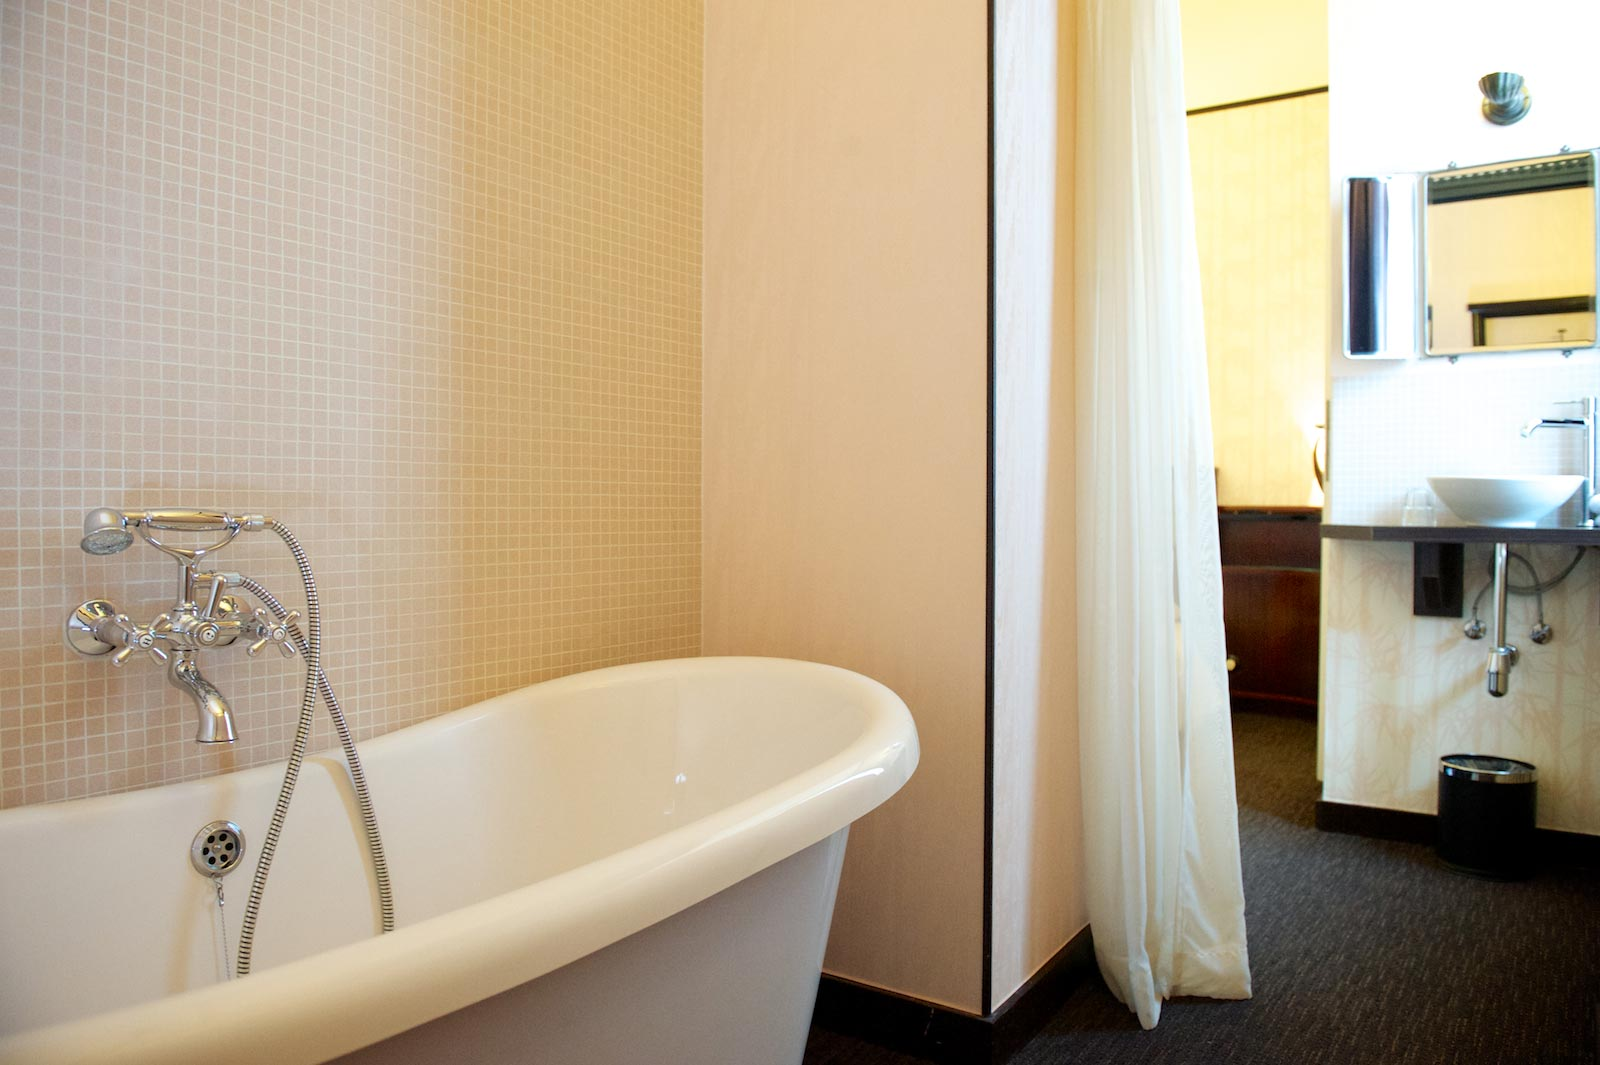 hotel-le-berger-rooms-superieur-jeanne-10-01.jpg